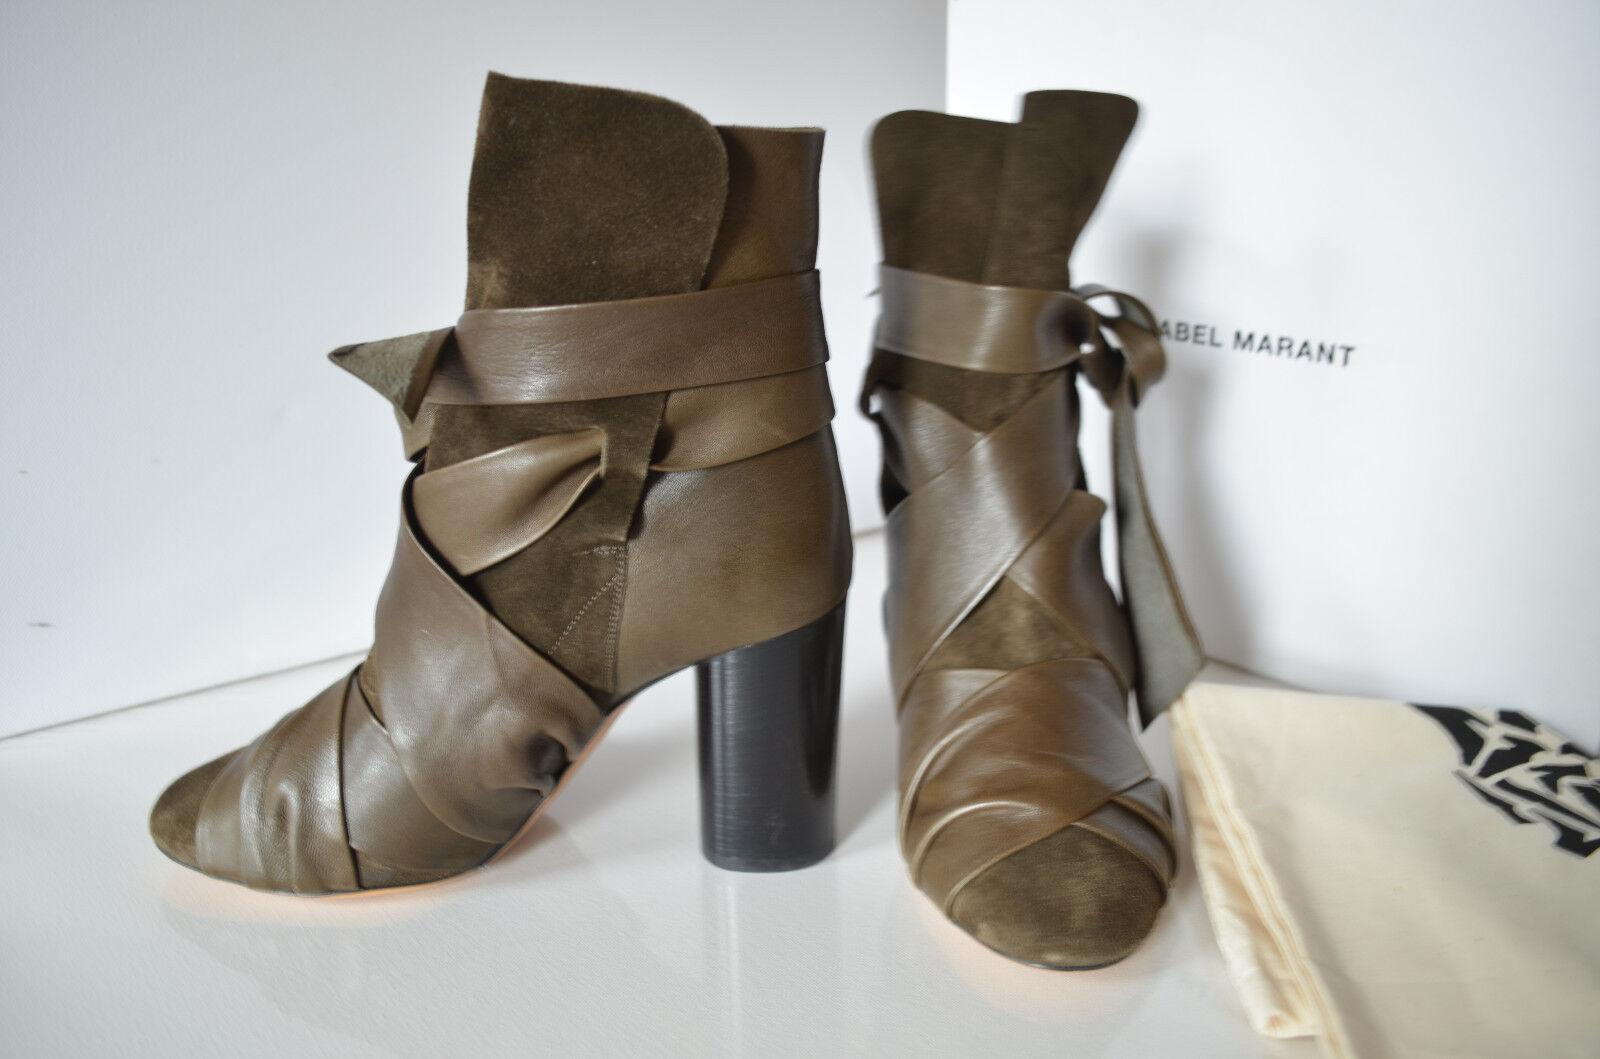 ISABELL MARANT Weihnachts Weihnachts Weihnachts Geschenk ankle Stiefel Stiefeletten Leder Gr 40 Neu 624a4f